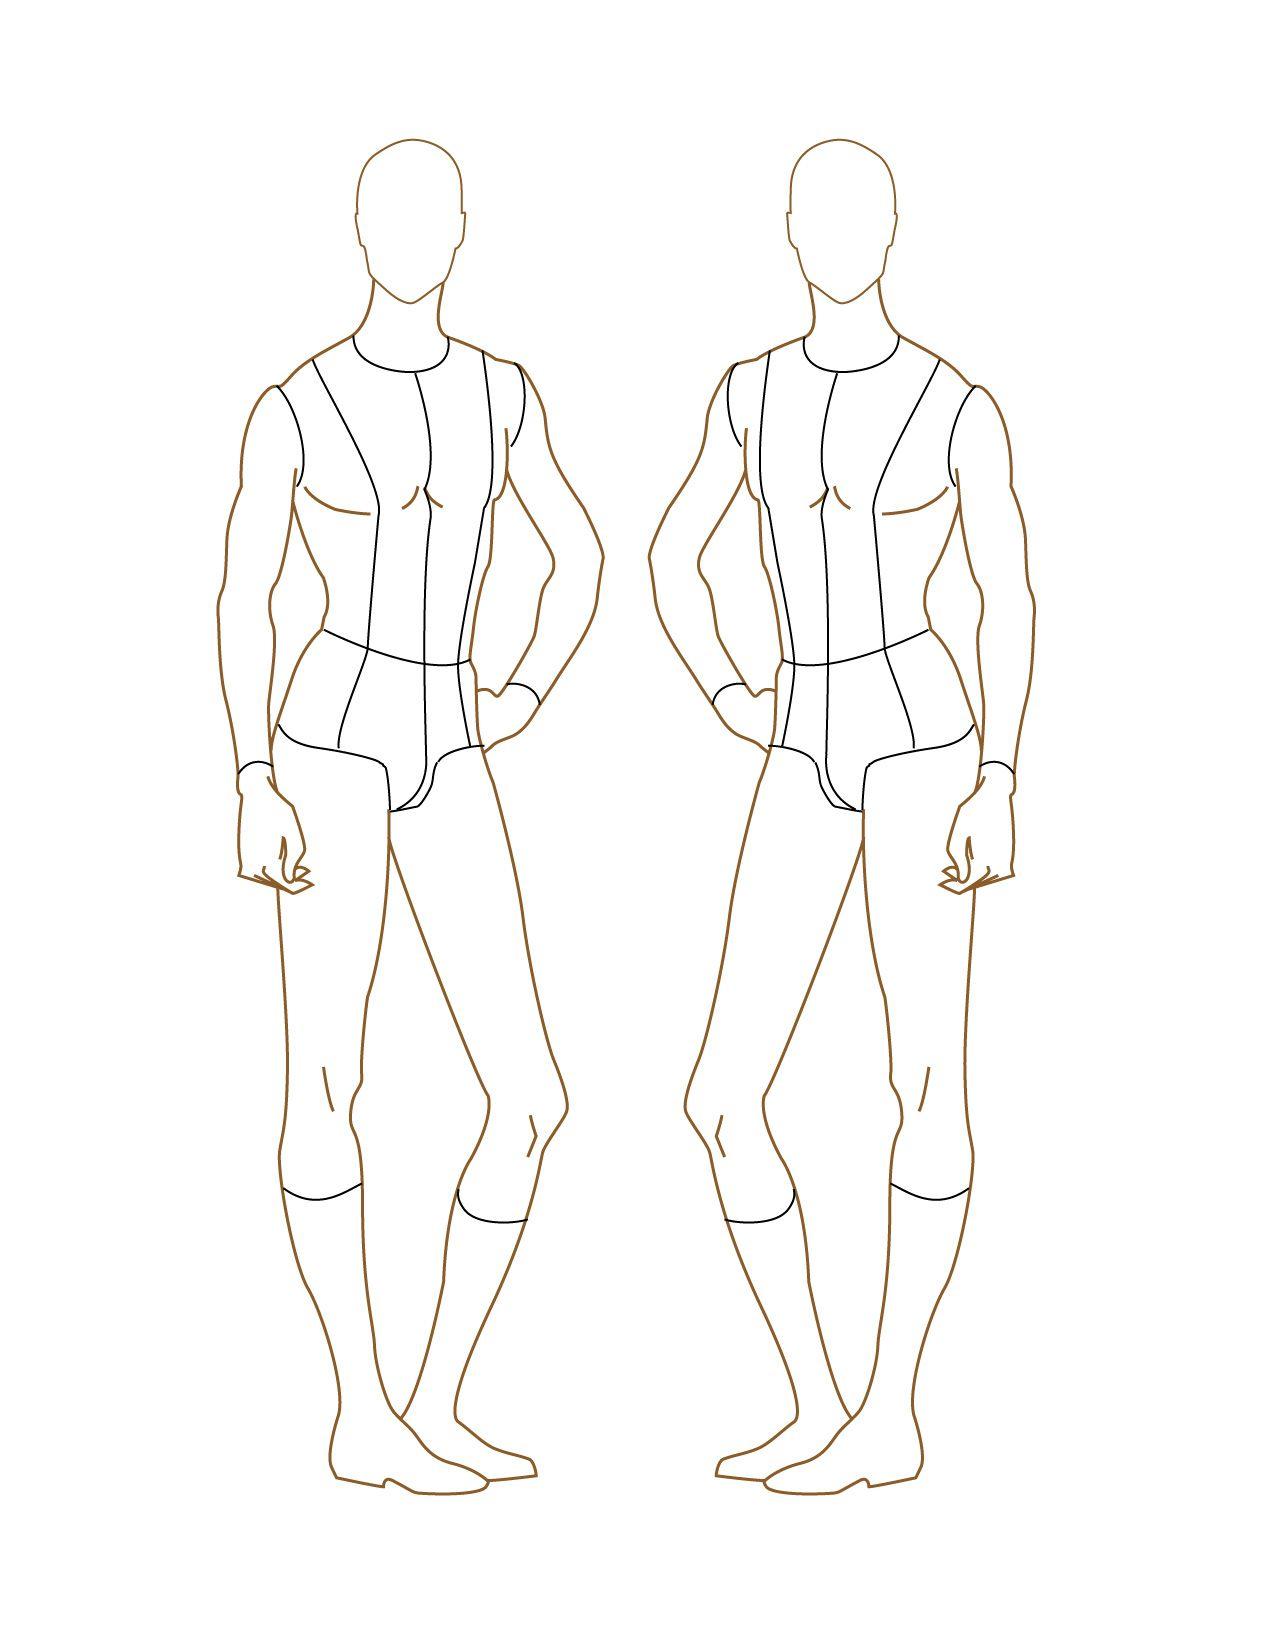 male-fashion-figure-croqui-009.jpg 1,275×1,650 pixels | Human ...